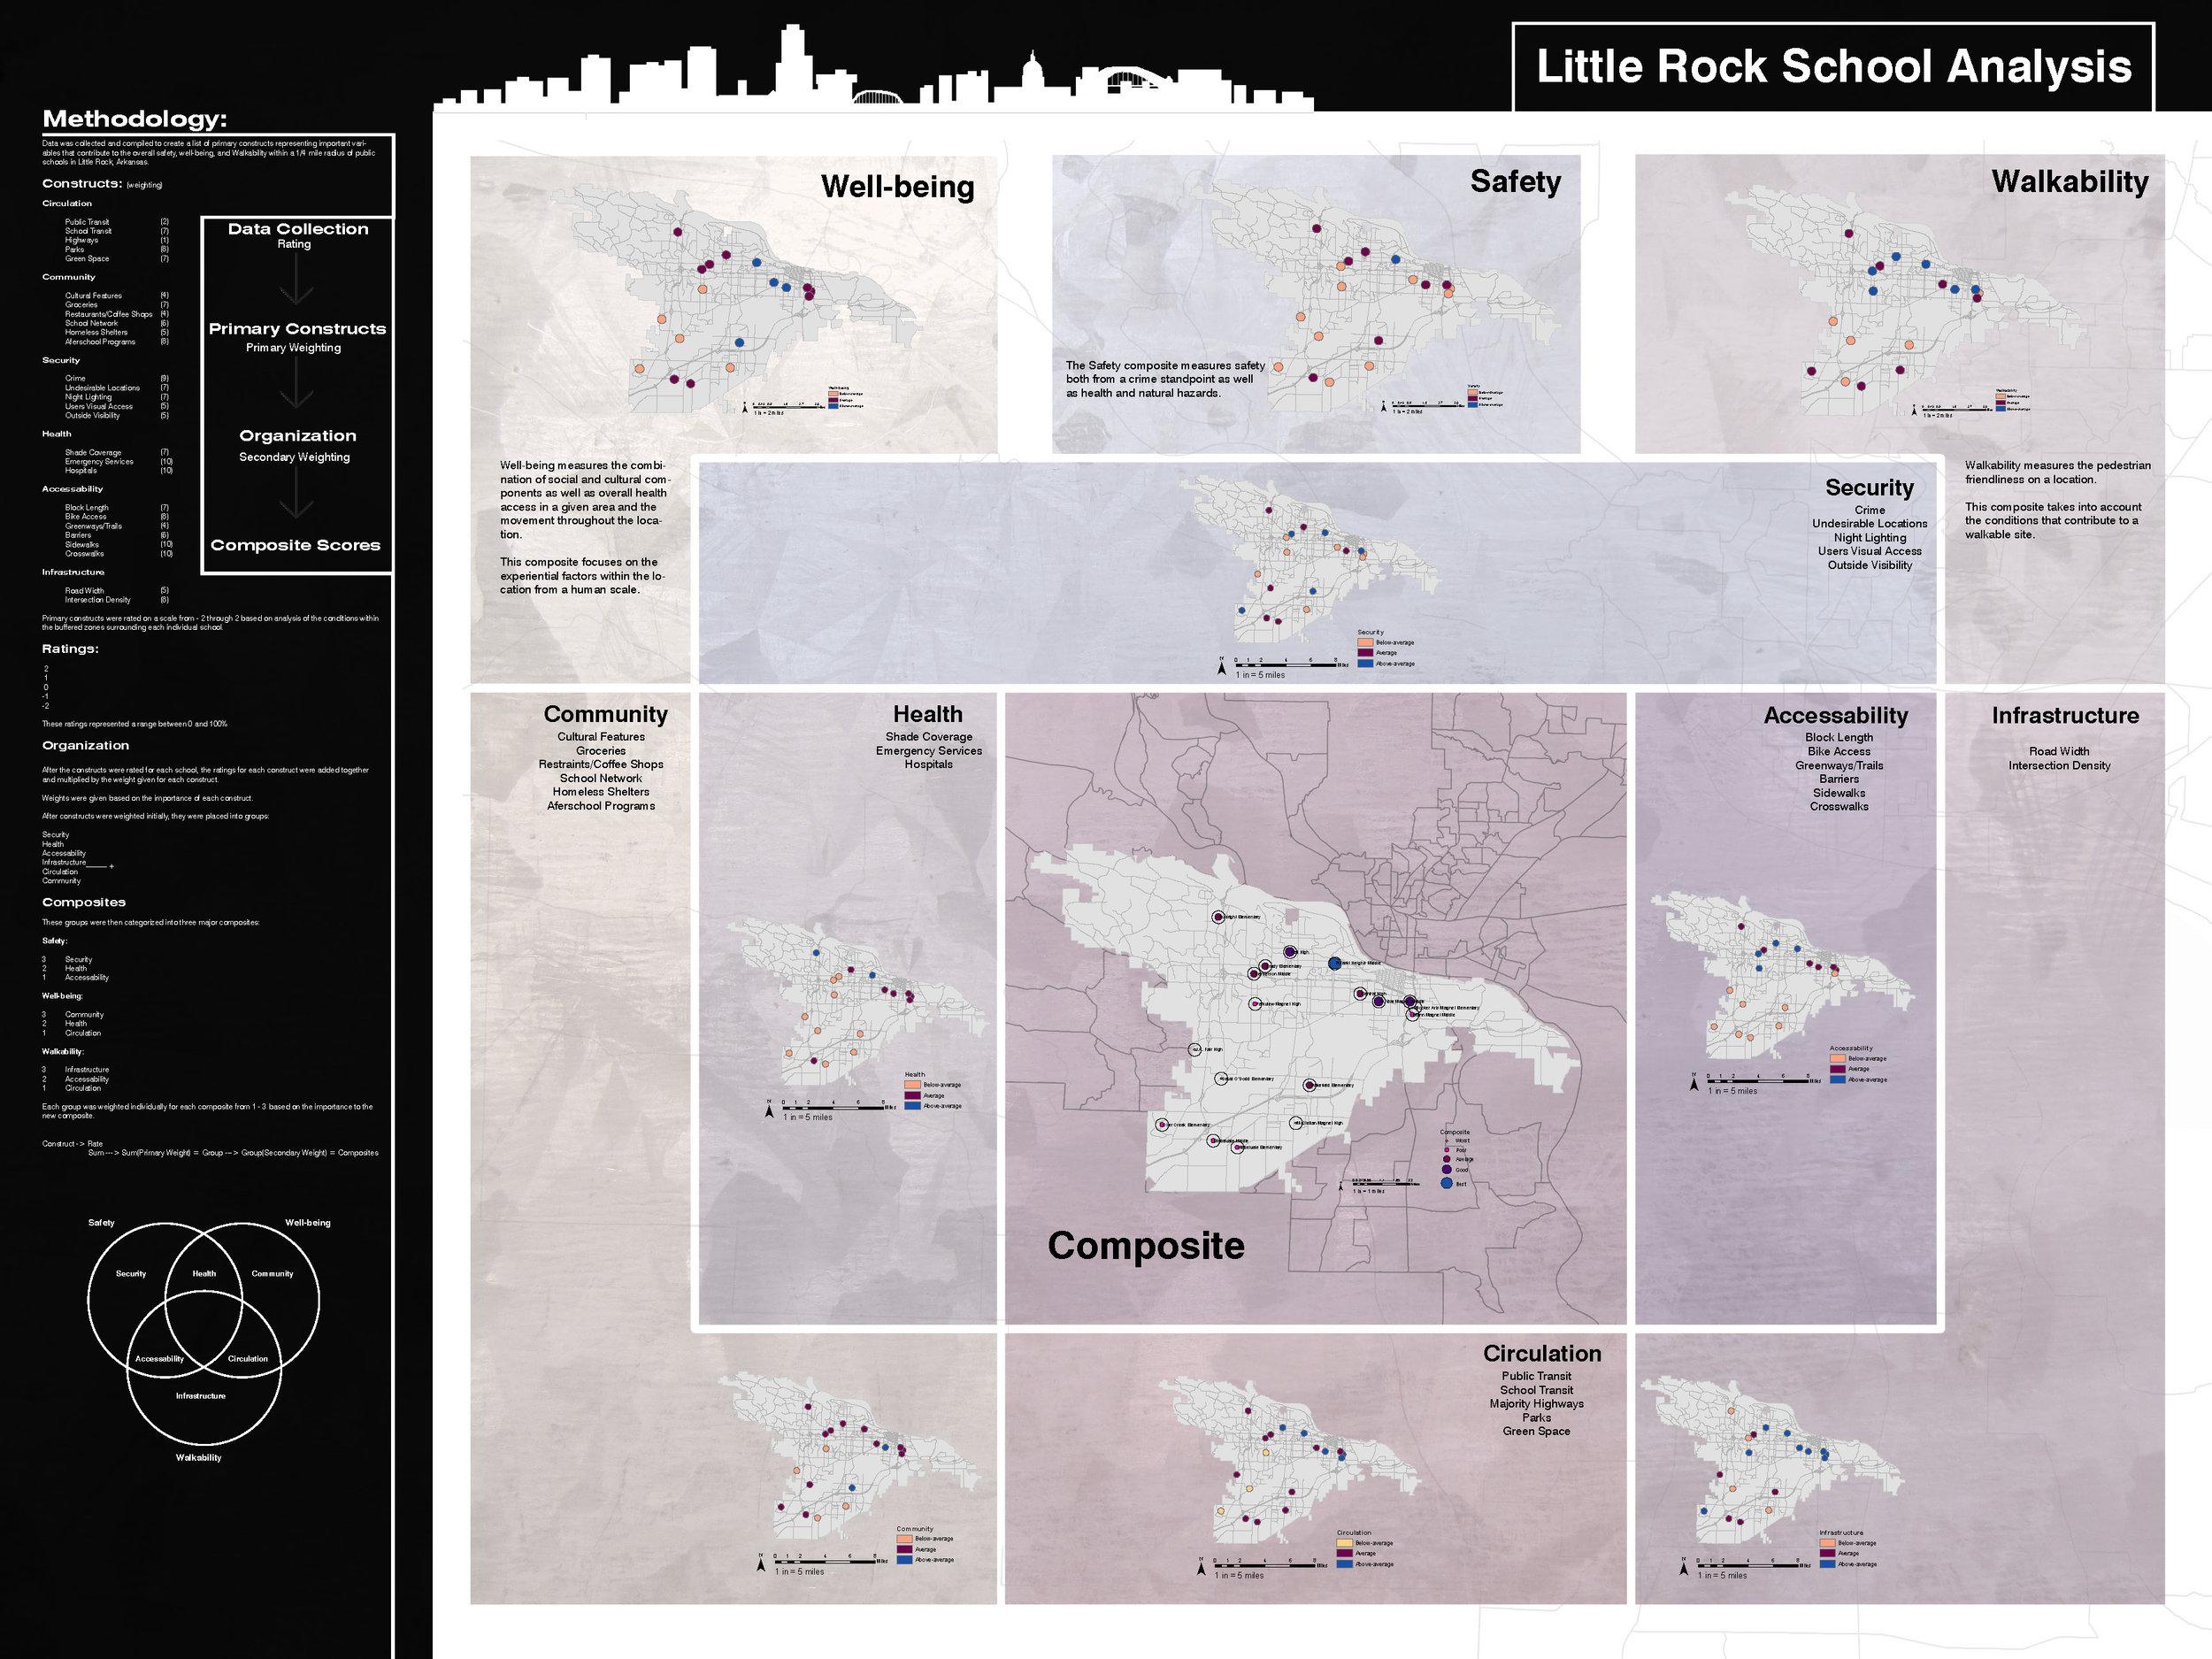 Little Rock School Analysis Poster - COSTELLO.jpg